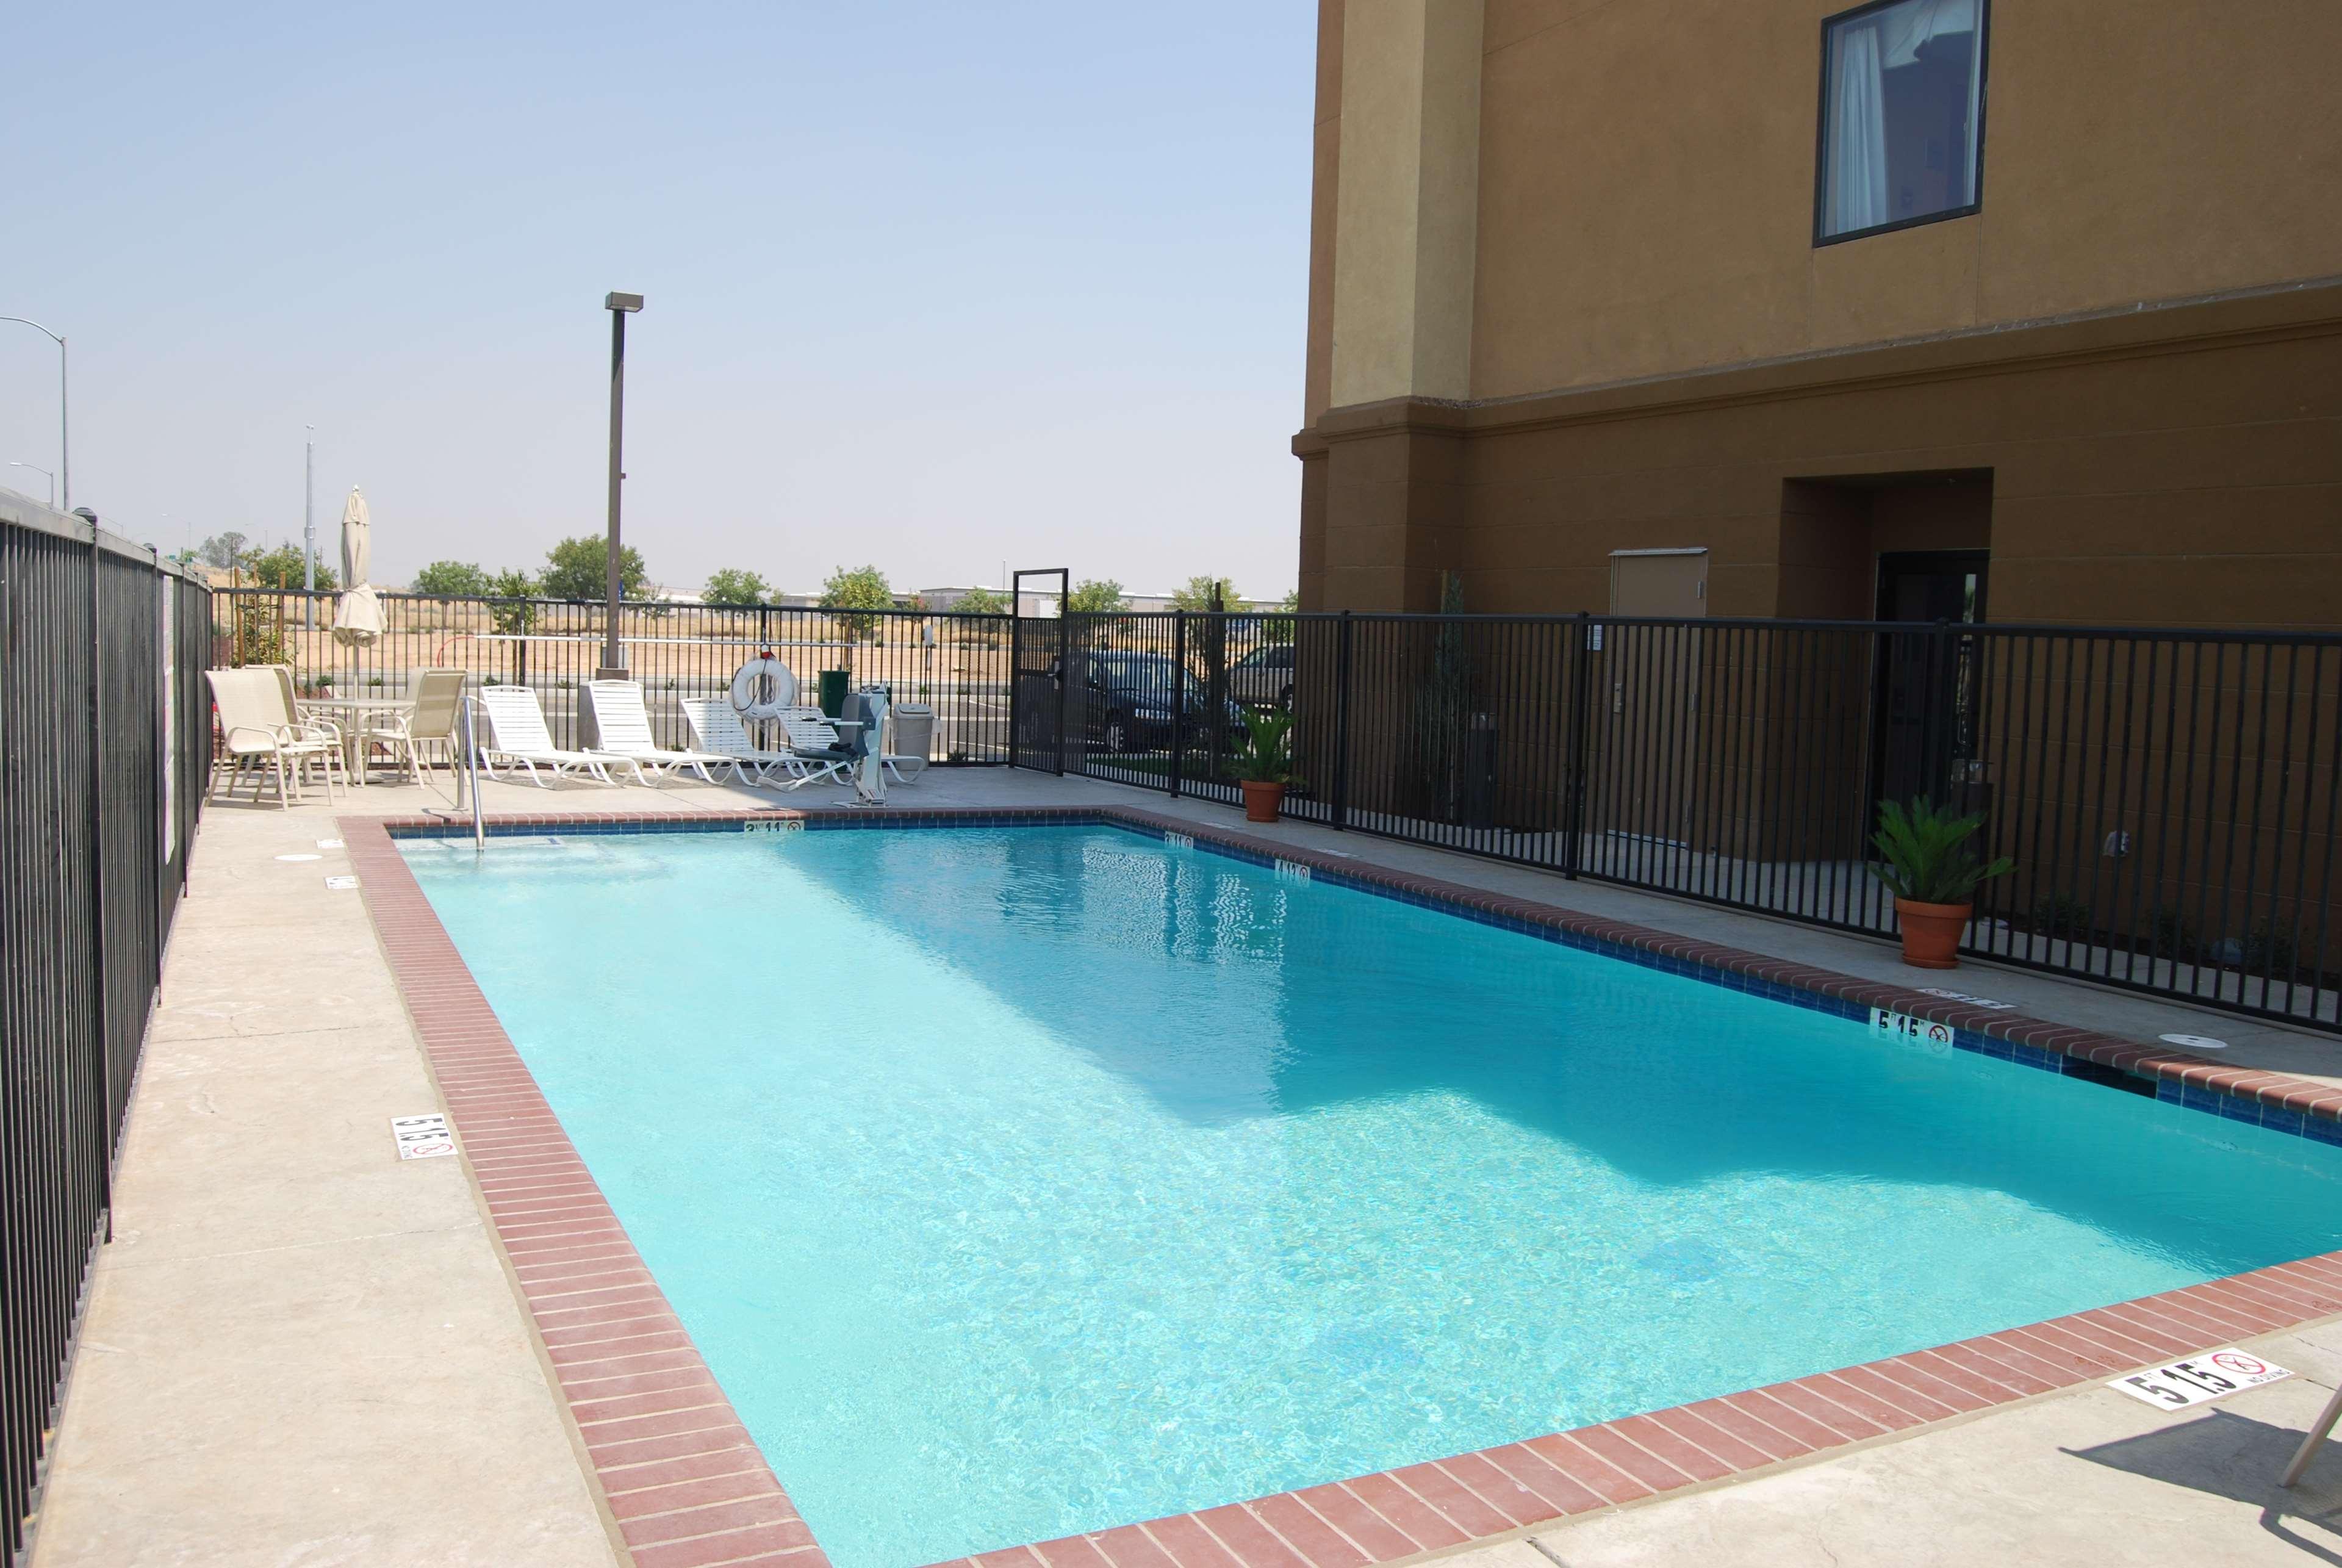 Hampton Inn & Suites Madera image 4